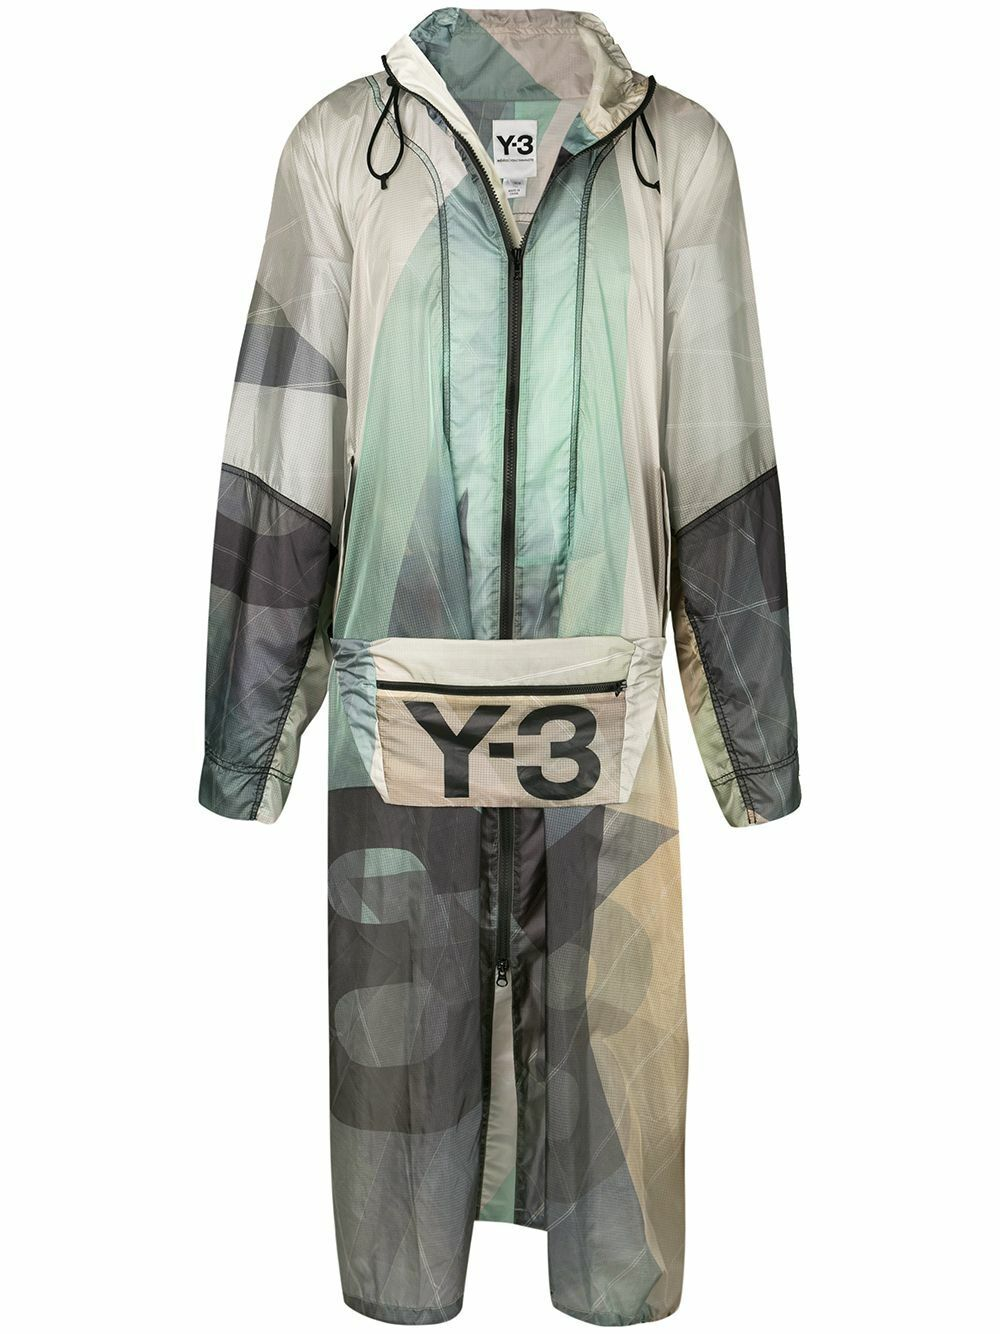 Adidas Y-3 Yohji Yamamoto Sailing Poncho Mantel Jacke Jacket DY7283 Herren Gr. M